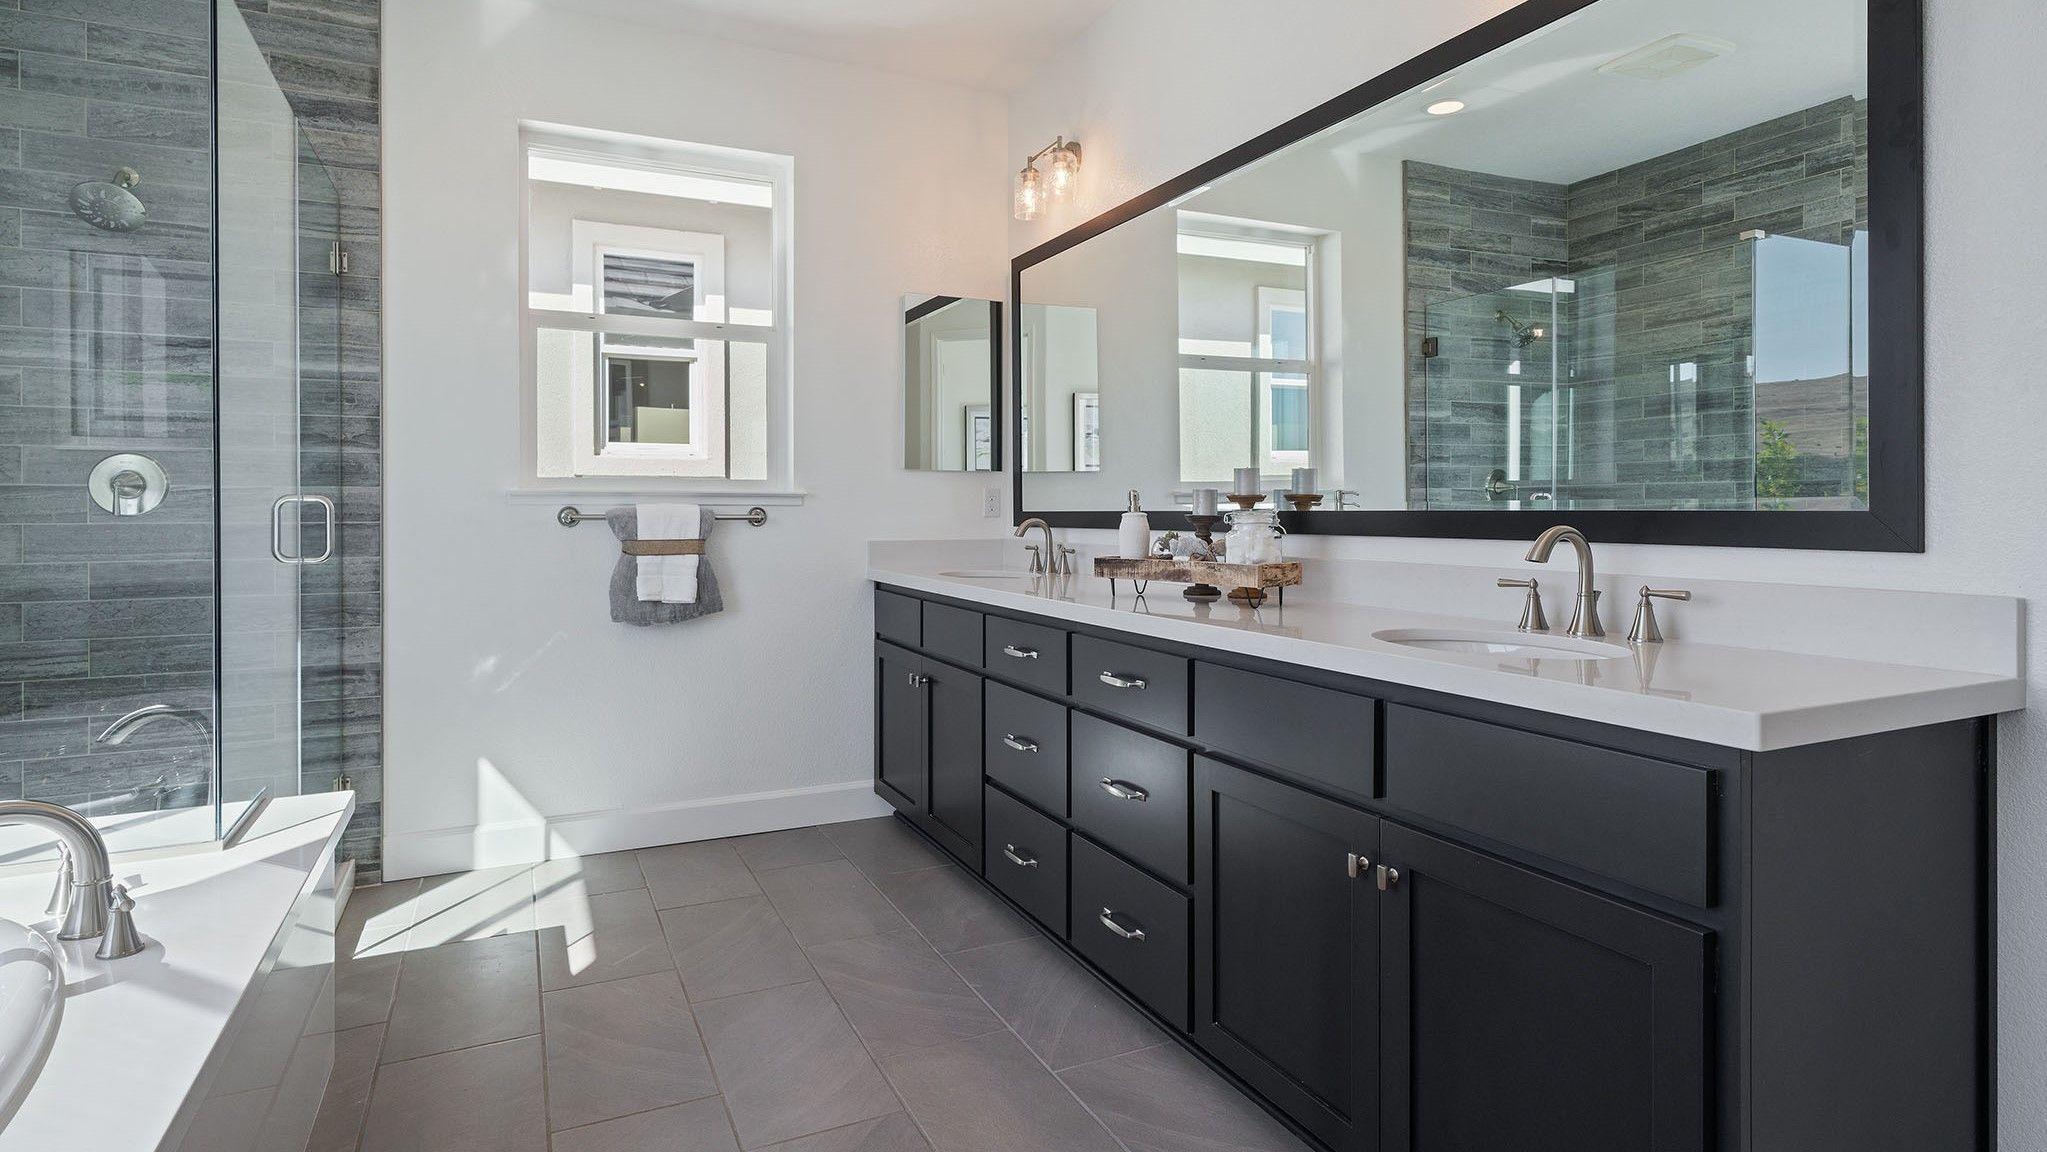 Bathroom featured in the Barton By Seeno Homes in Vallejo-Napa, CA